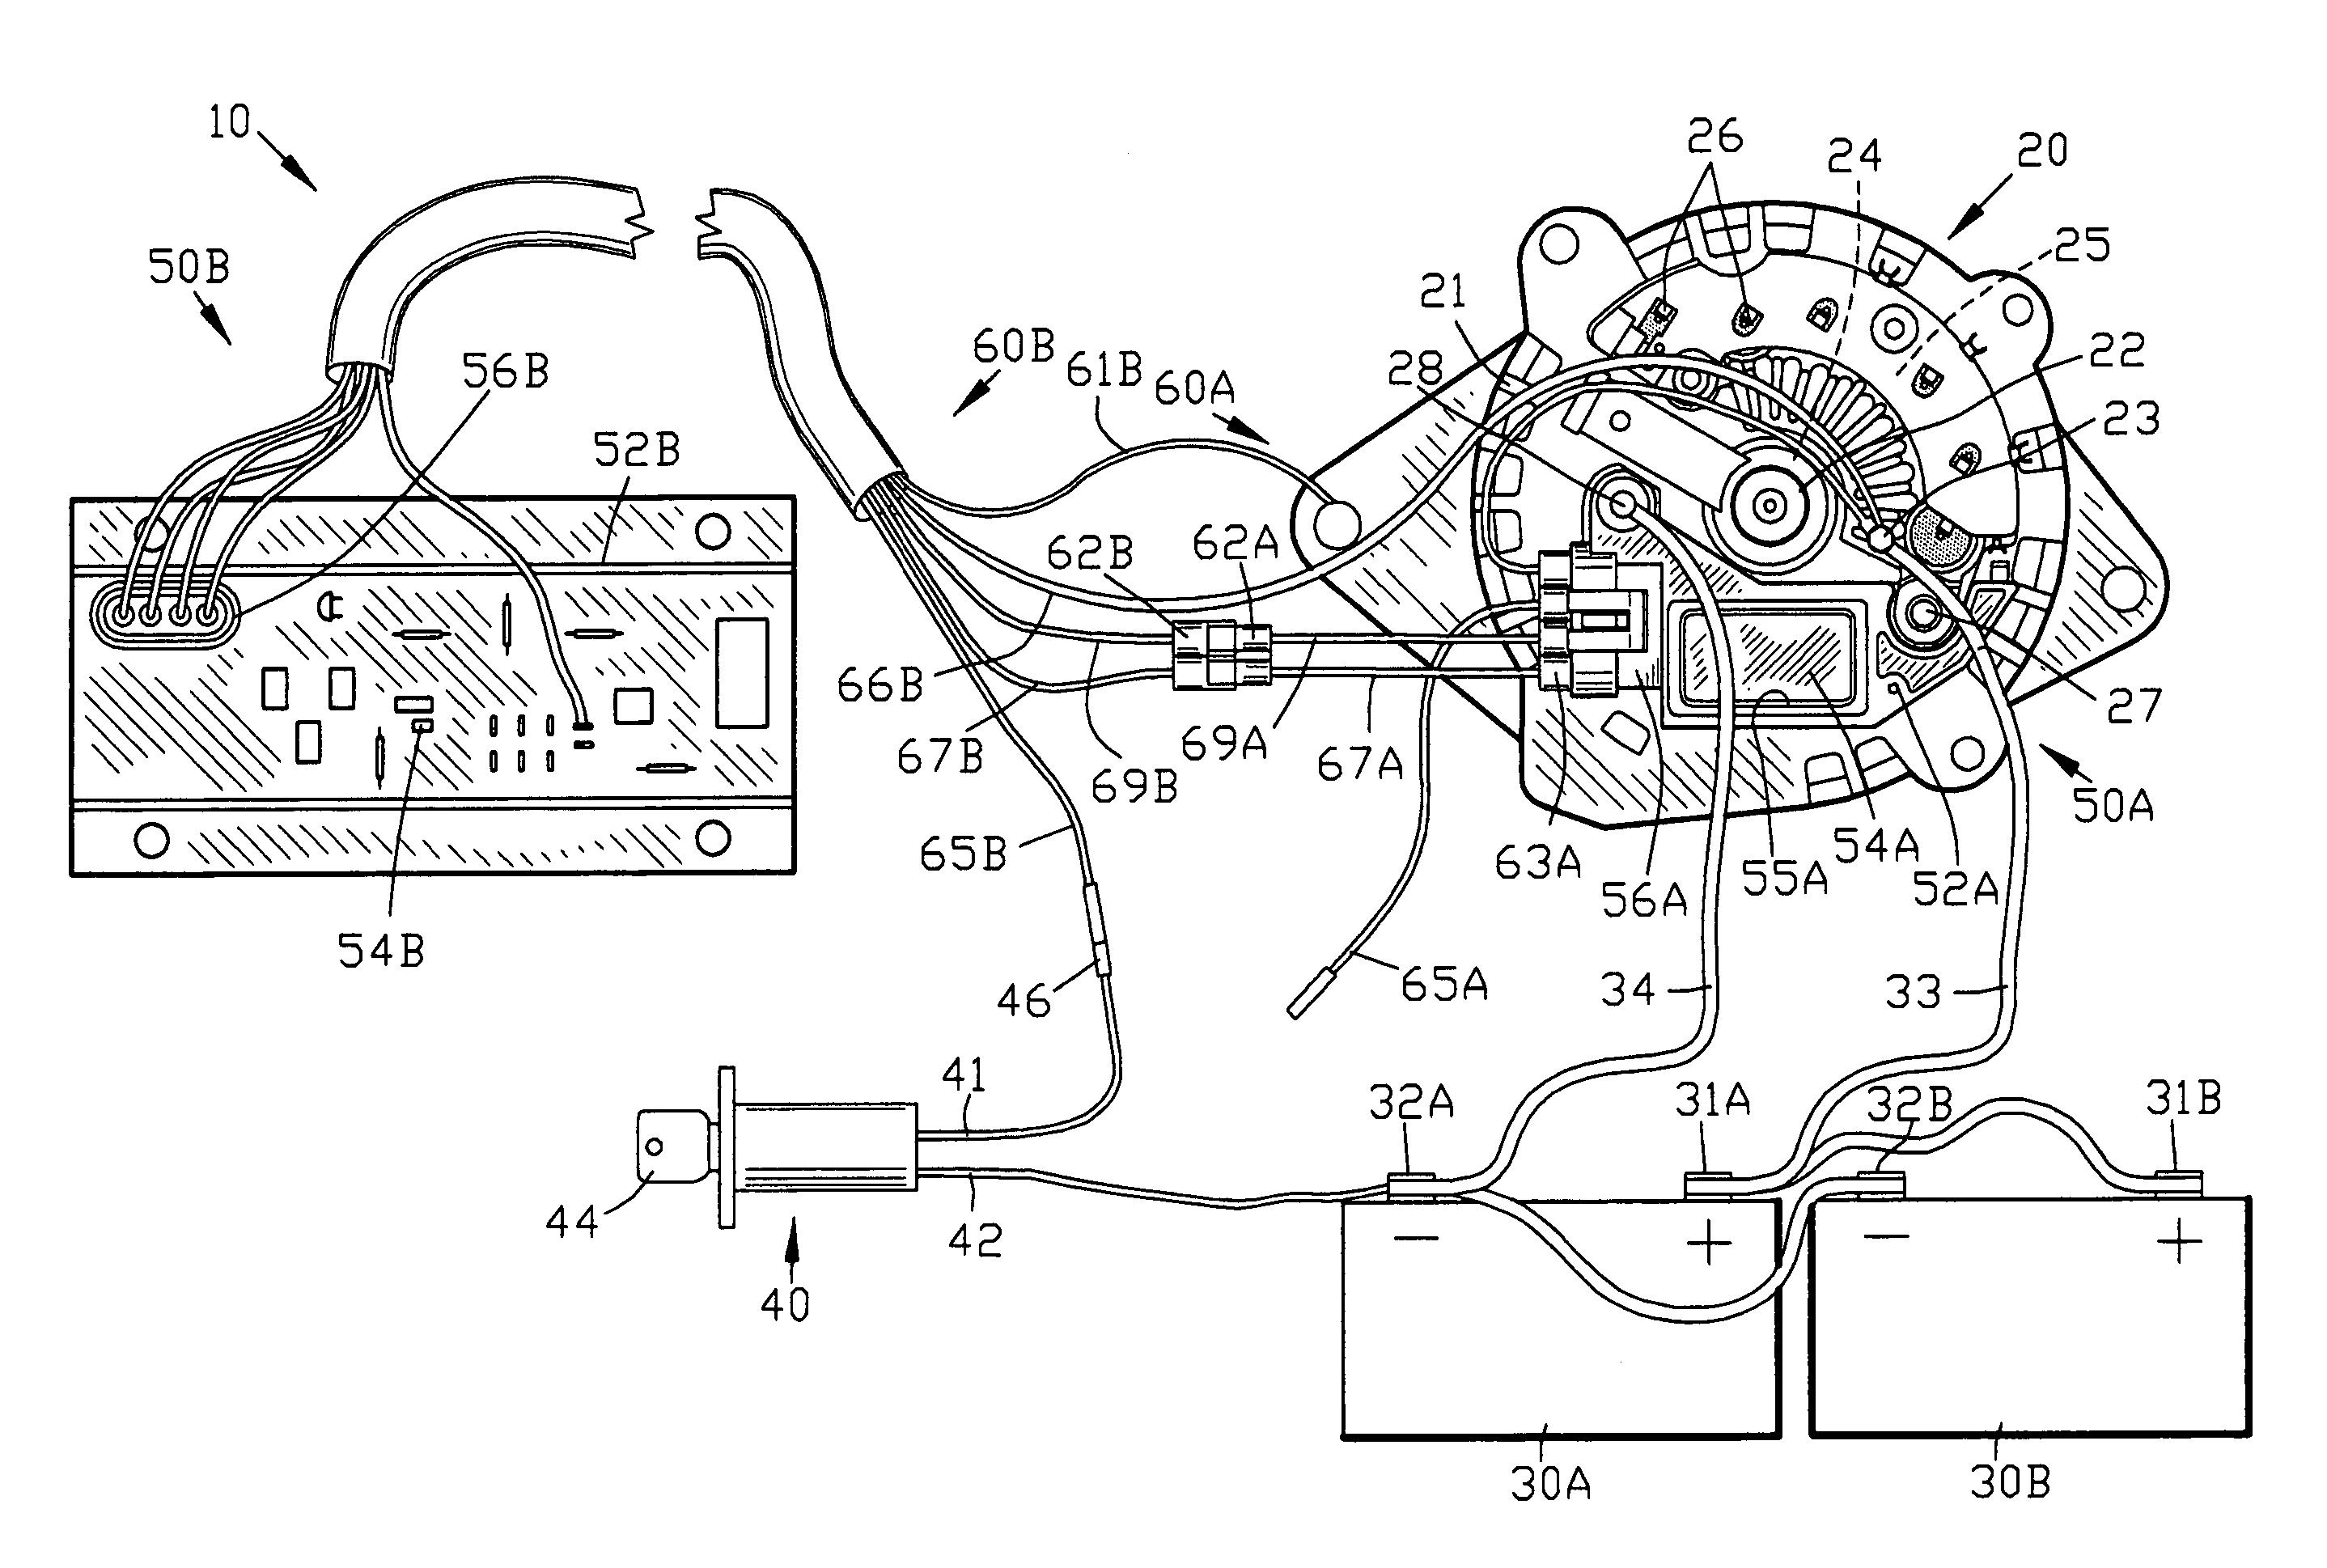 Mando Alternator Wiring Diagram - Somurich.com on